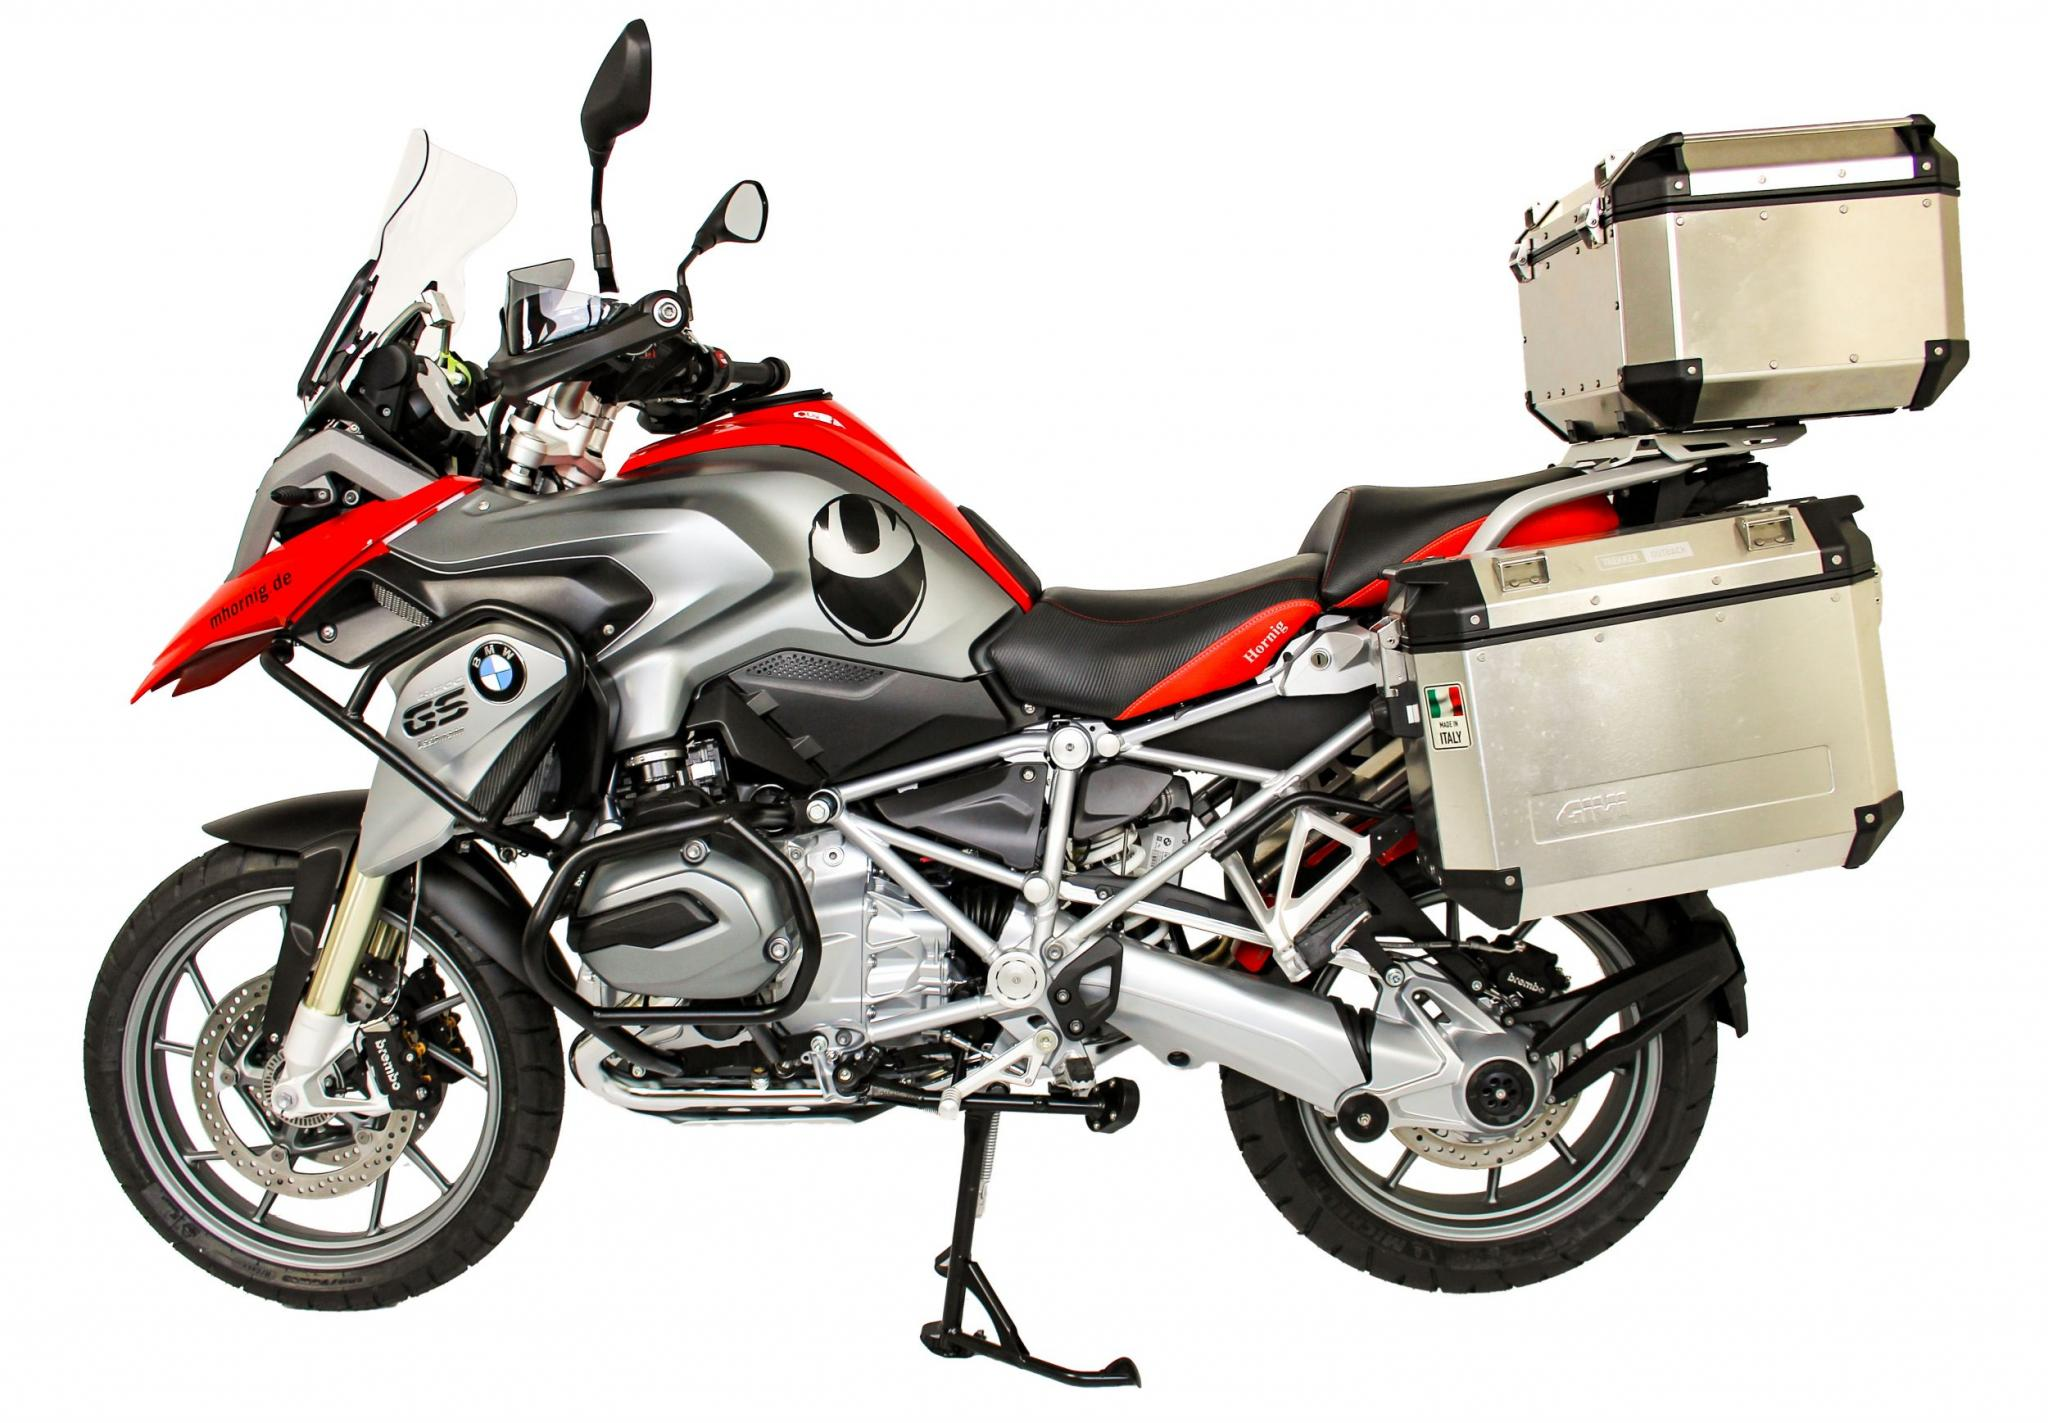 hornig bmw r 1200 gs umbau 2016 motorrad fotos motorrad. Black Bedroom Furniture Sets. Home Design Ideas